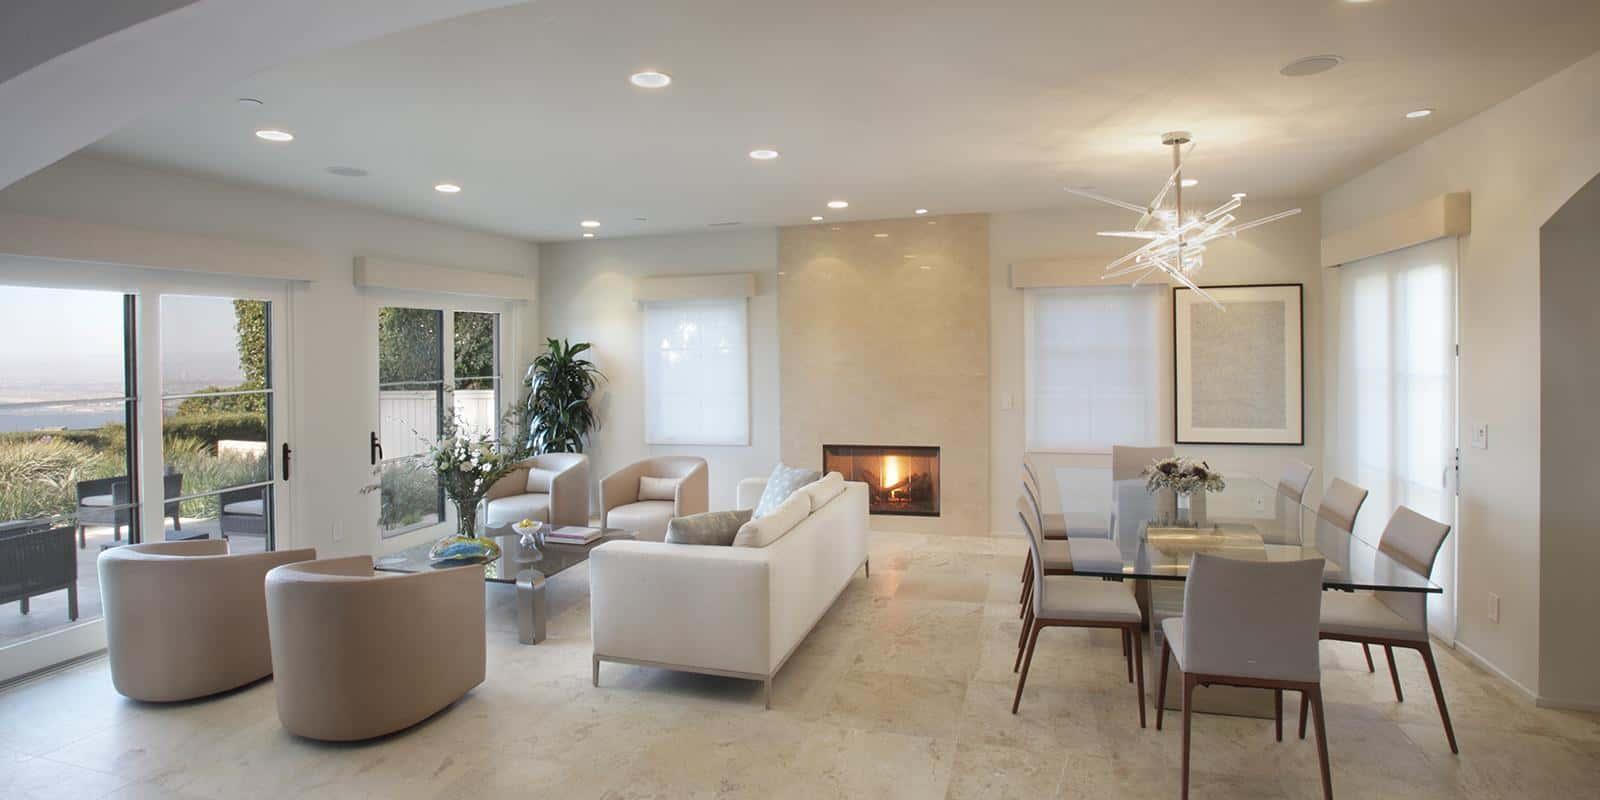 Interior Design Palos Verdes and The South Bay Living Room